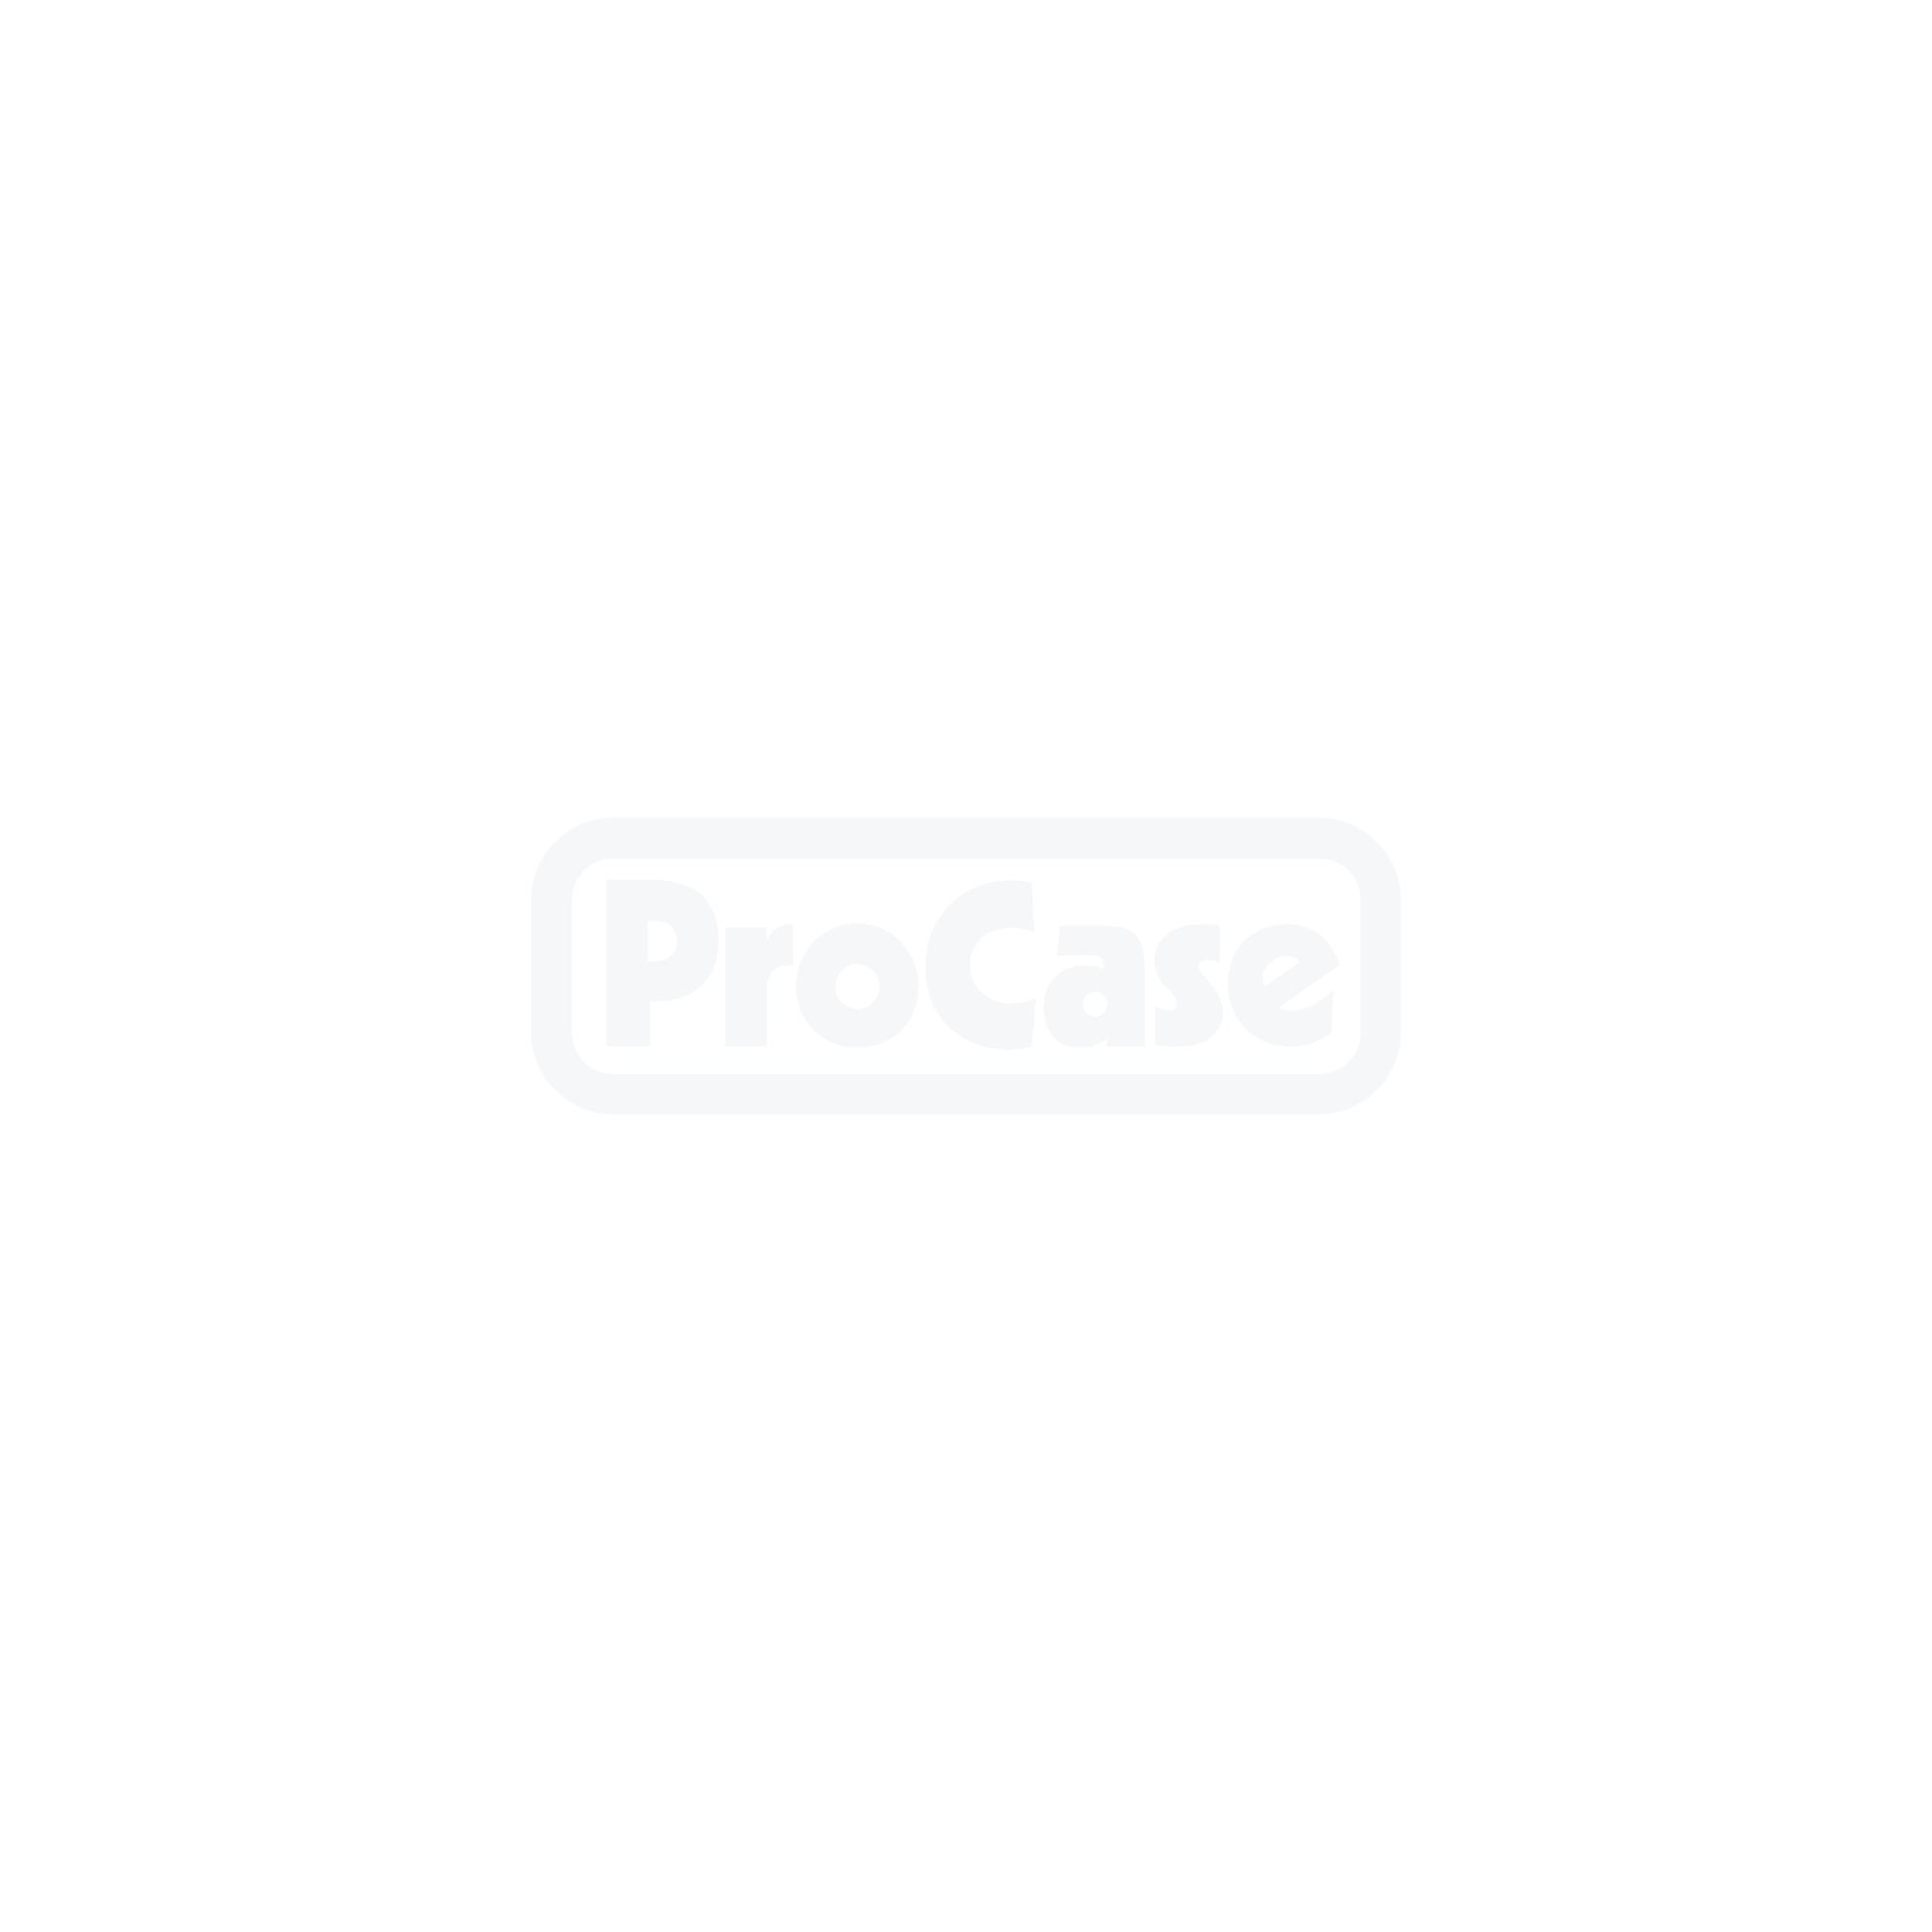 Transportcase Vario-Flex 120 Plus 750 mm hoch 2